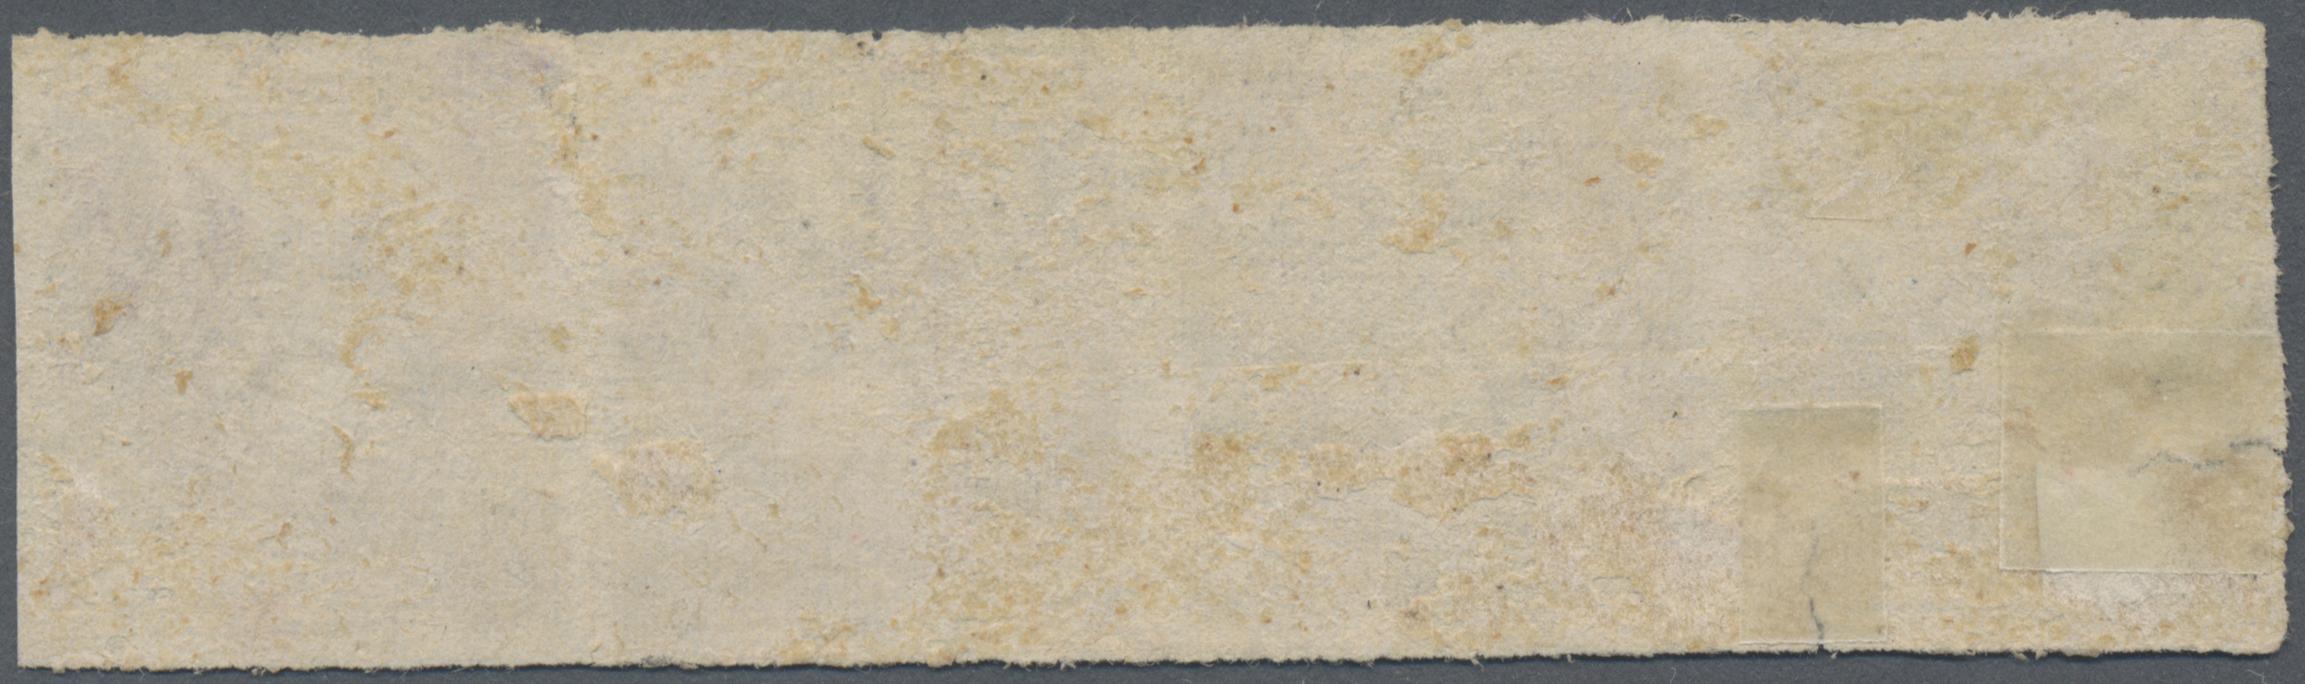 Lot 05501 - China - Volksrepublik - Provinzen  -  Auktionshaus Christoph Gärtner GmbH & Co. KG Sale #45- Special Auction China